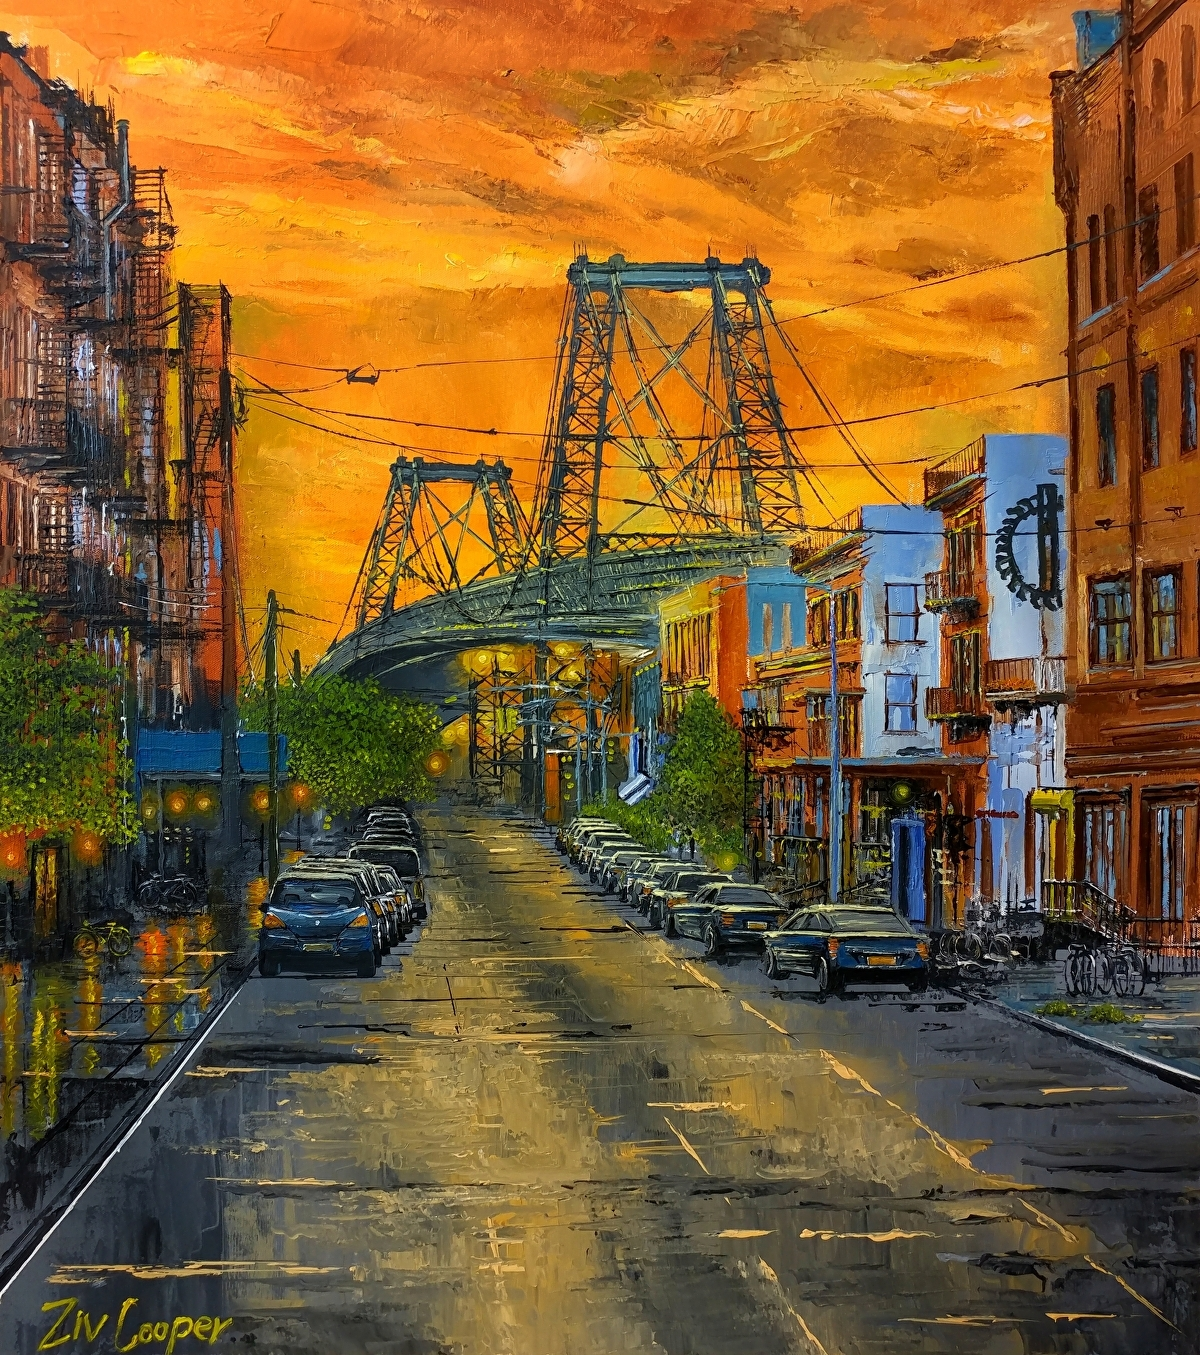 Ziv Cooper - Under the Bridge